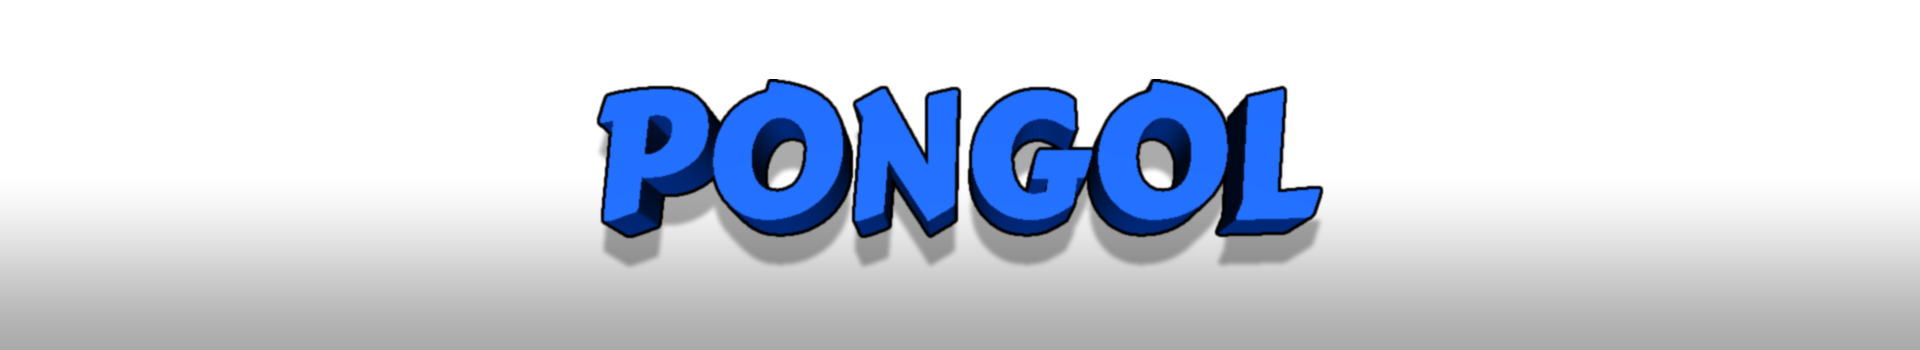 Pongol